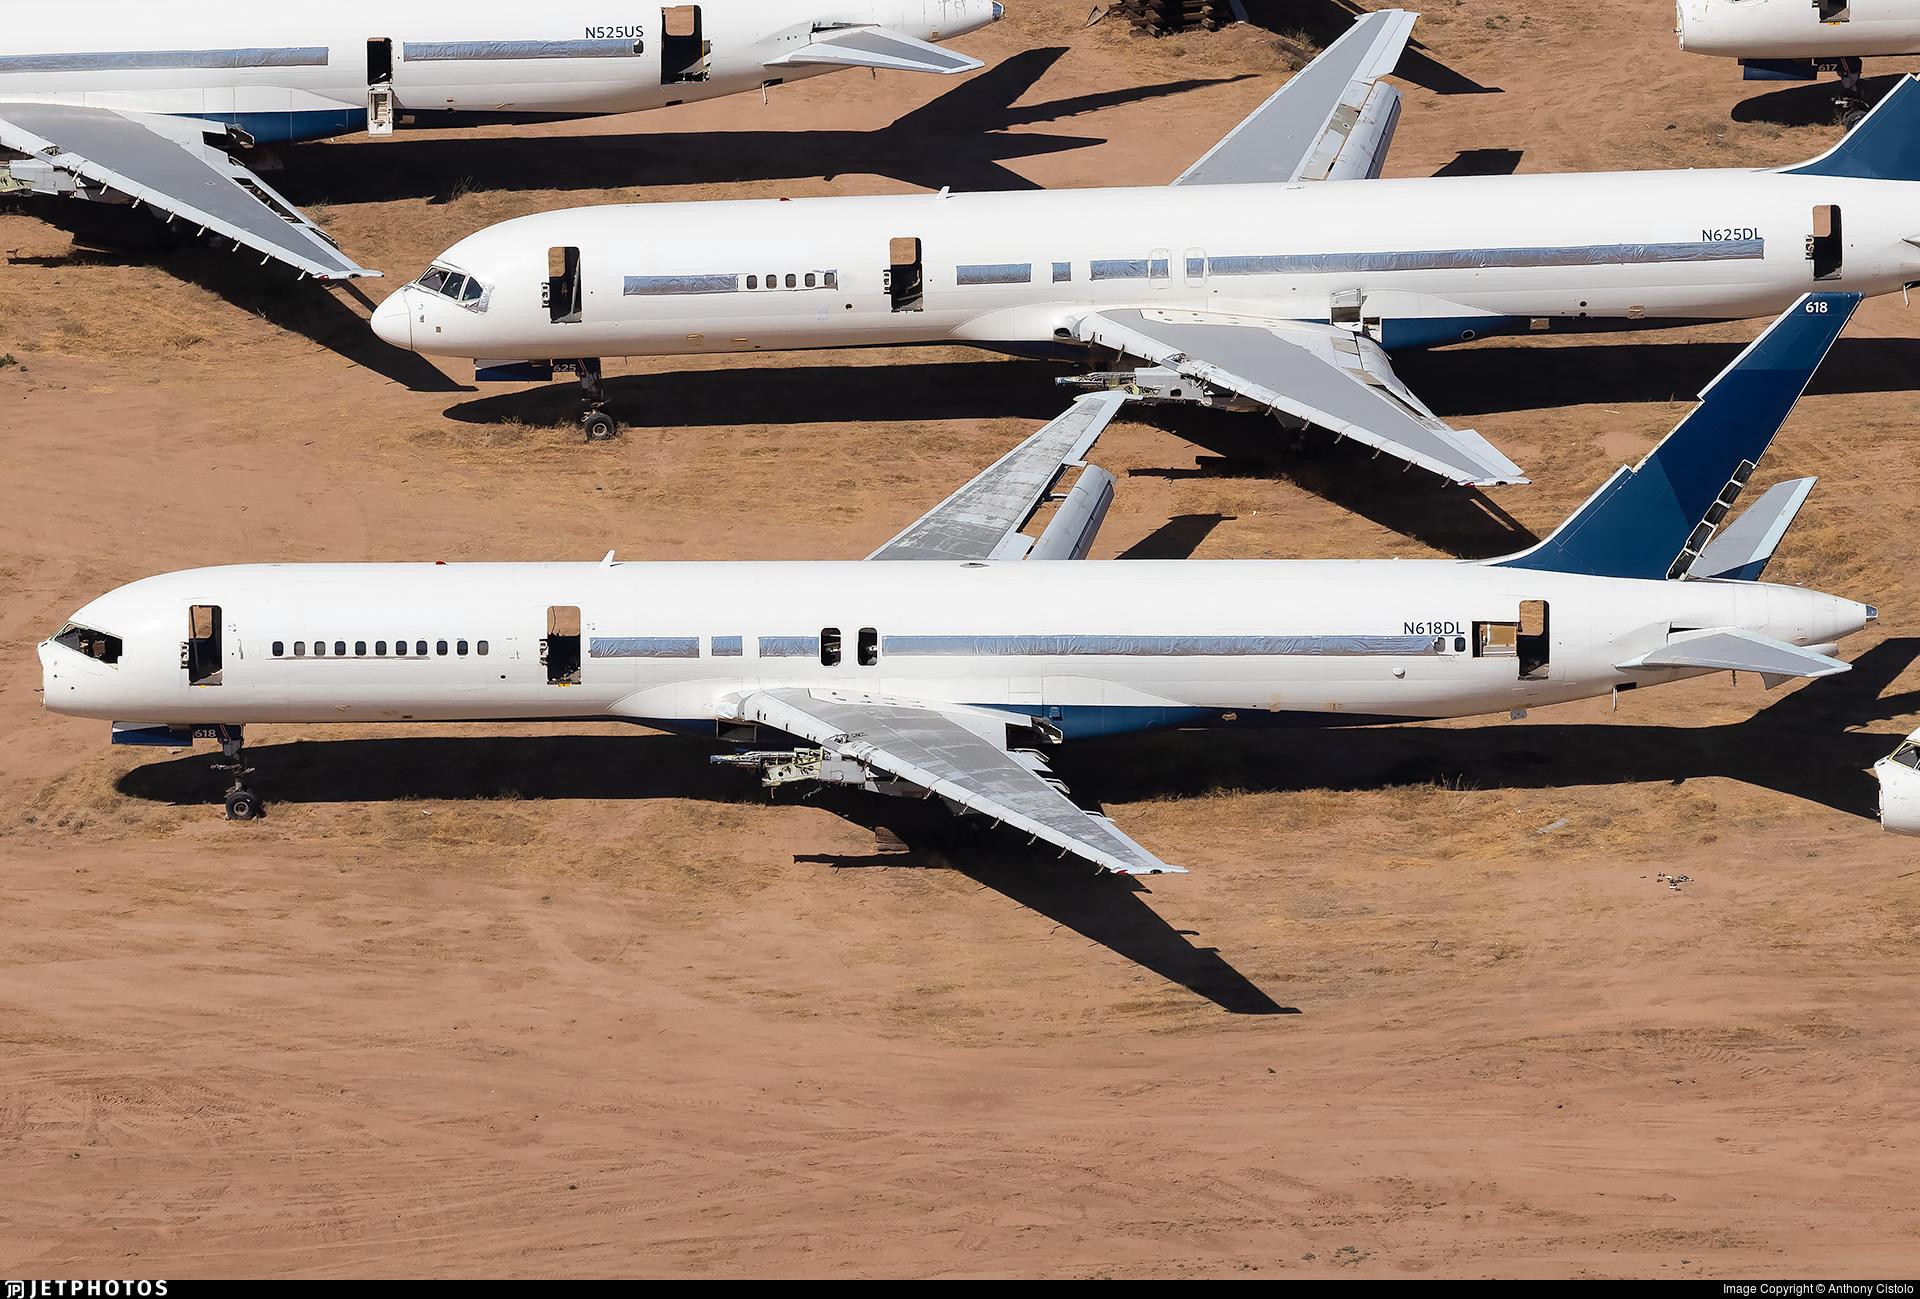 N618DL - Boeing 757-232 - Untitled